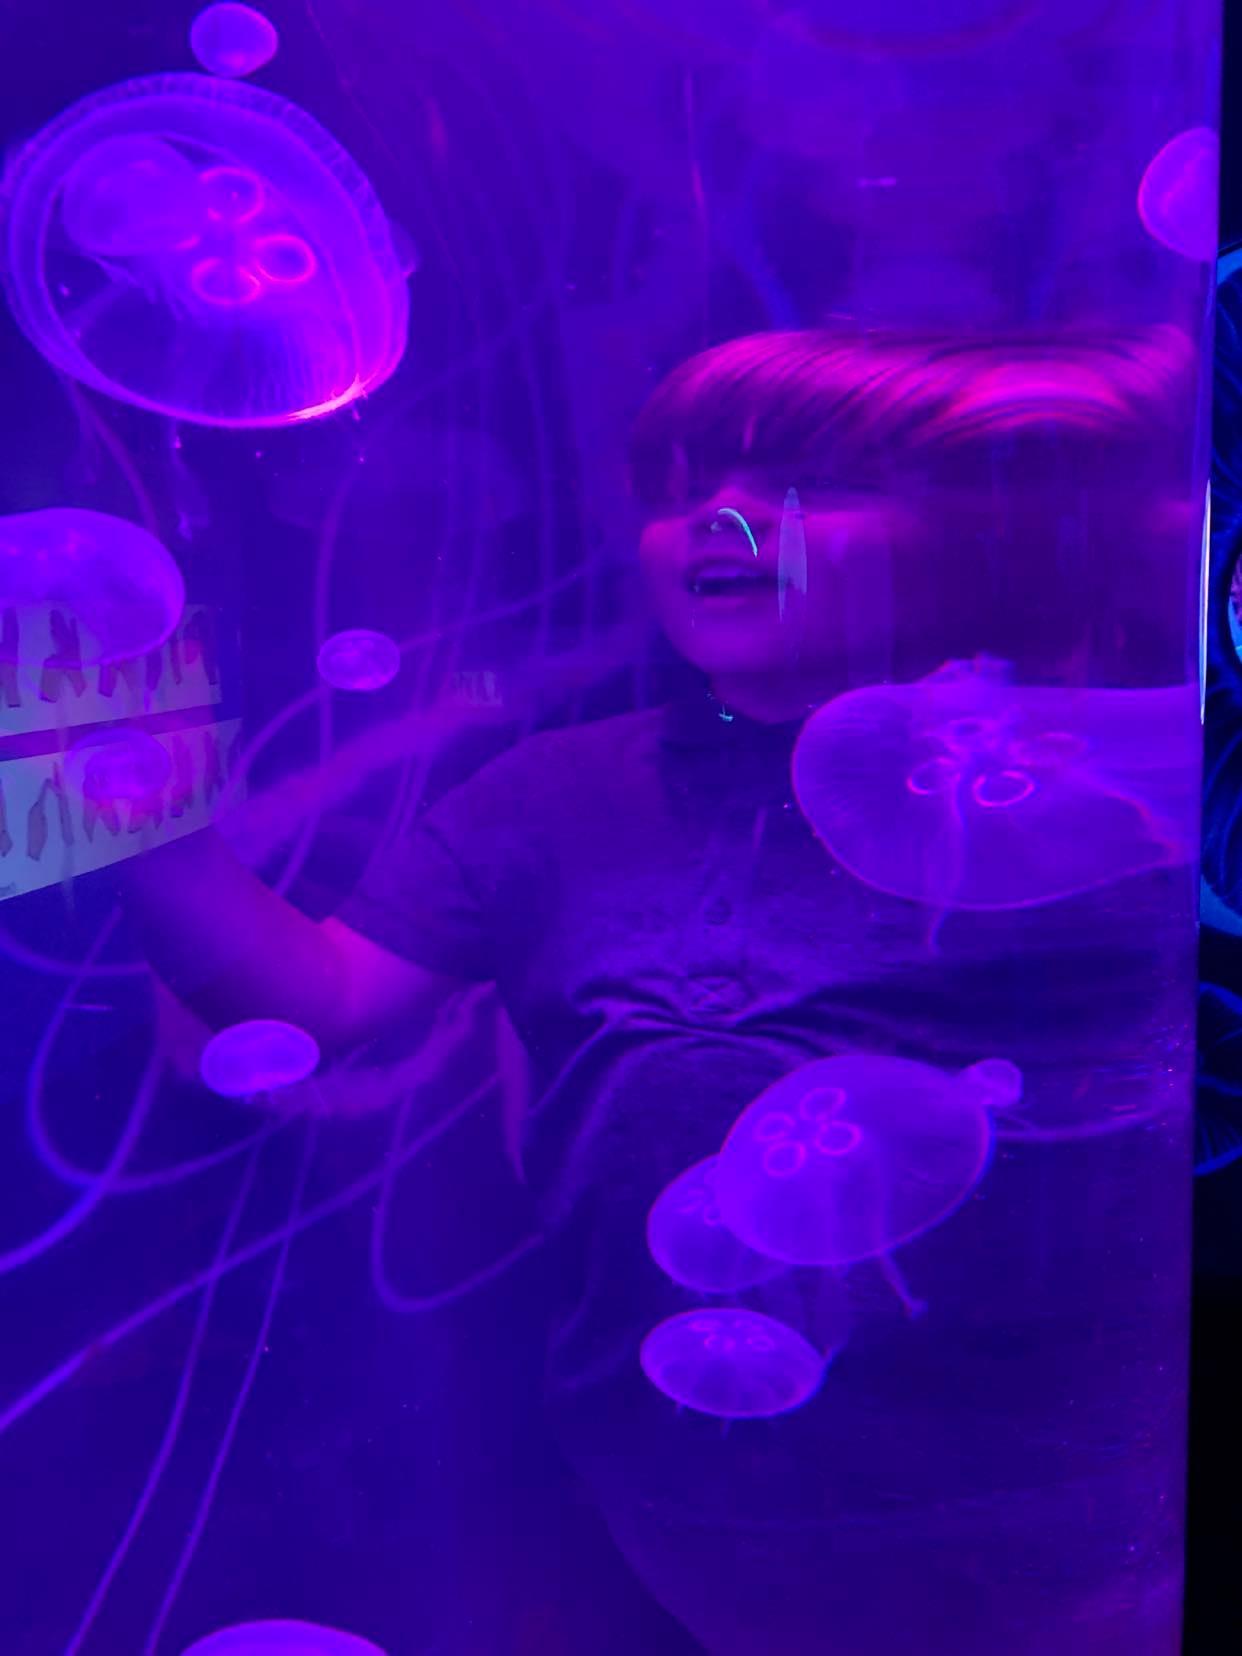 Sea life Great yarmouth review, a suffolk mum blog